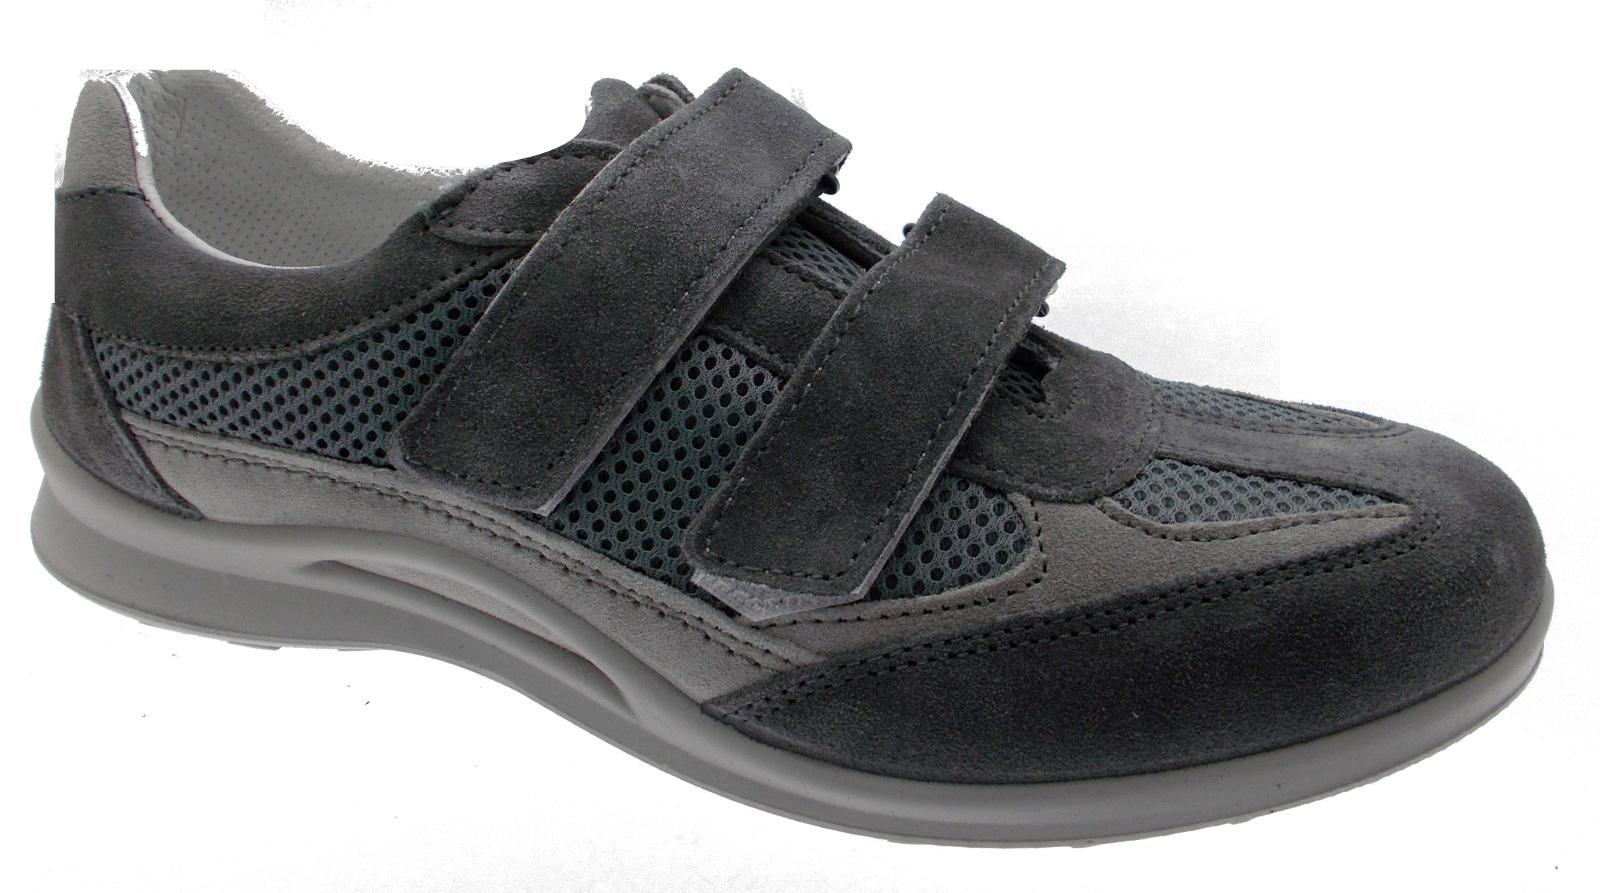 G0300 Goretex grijze sneaker schoen orthopedische plantaris man loren